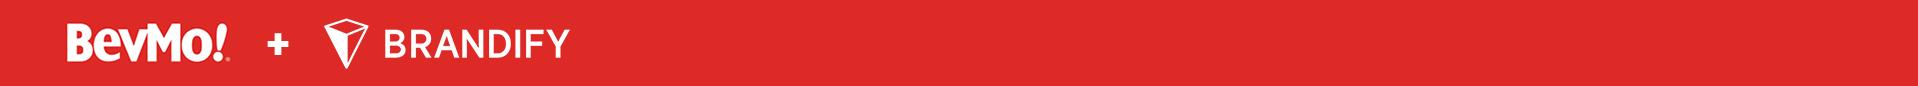 Bevmo banner